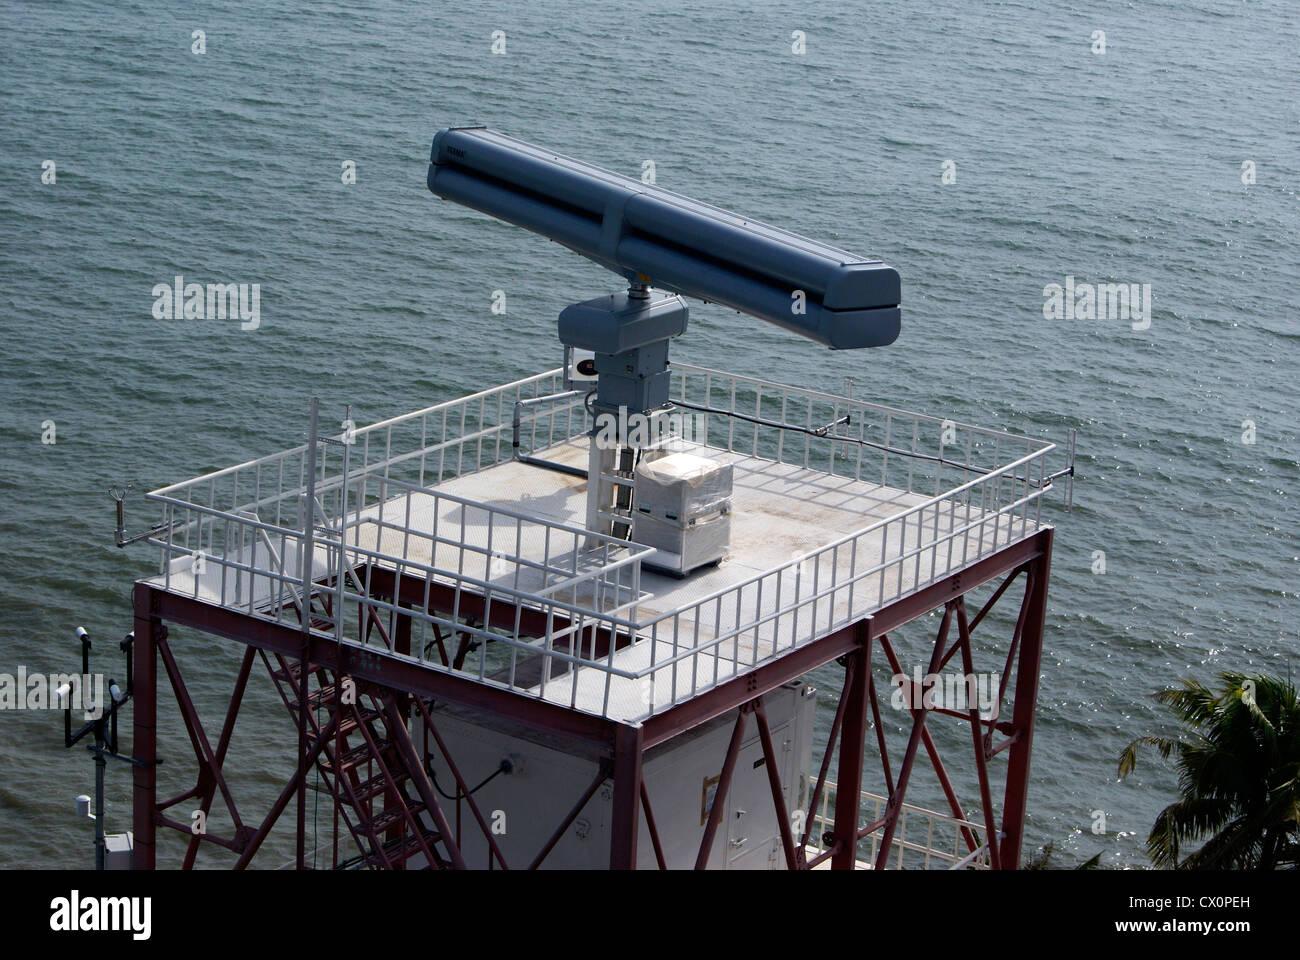 National weather service marine forecast. Modern Radar Surveillance On The Arabian Sea Kerala Coastal Region For Monitoring Ships And Detecting Pirate Boats Stock Photo Alamy